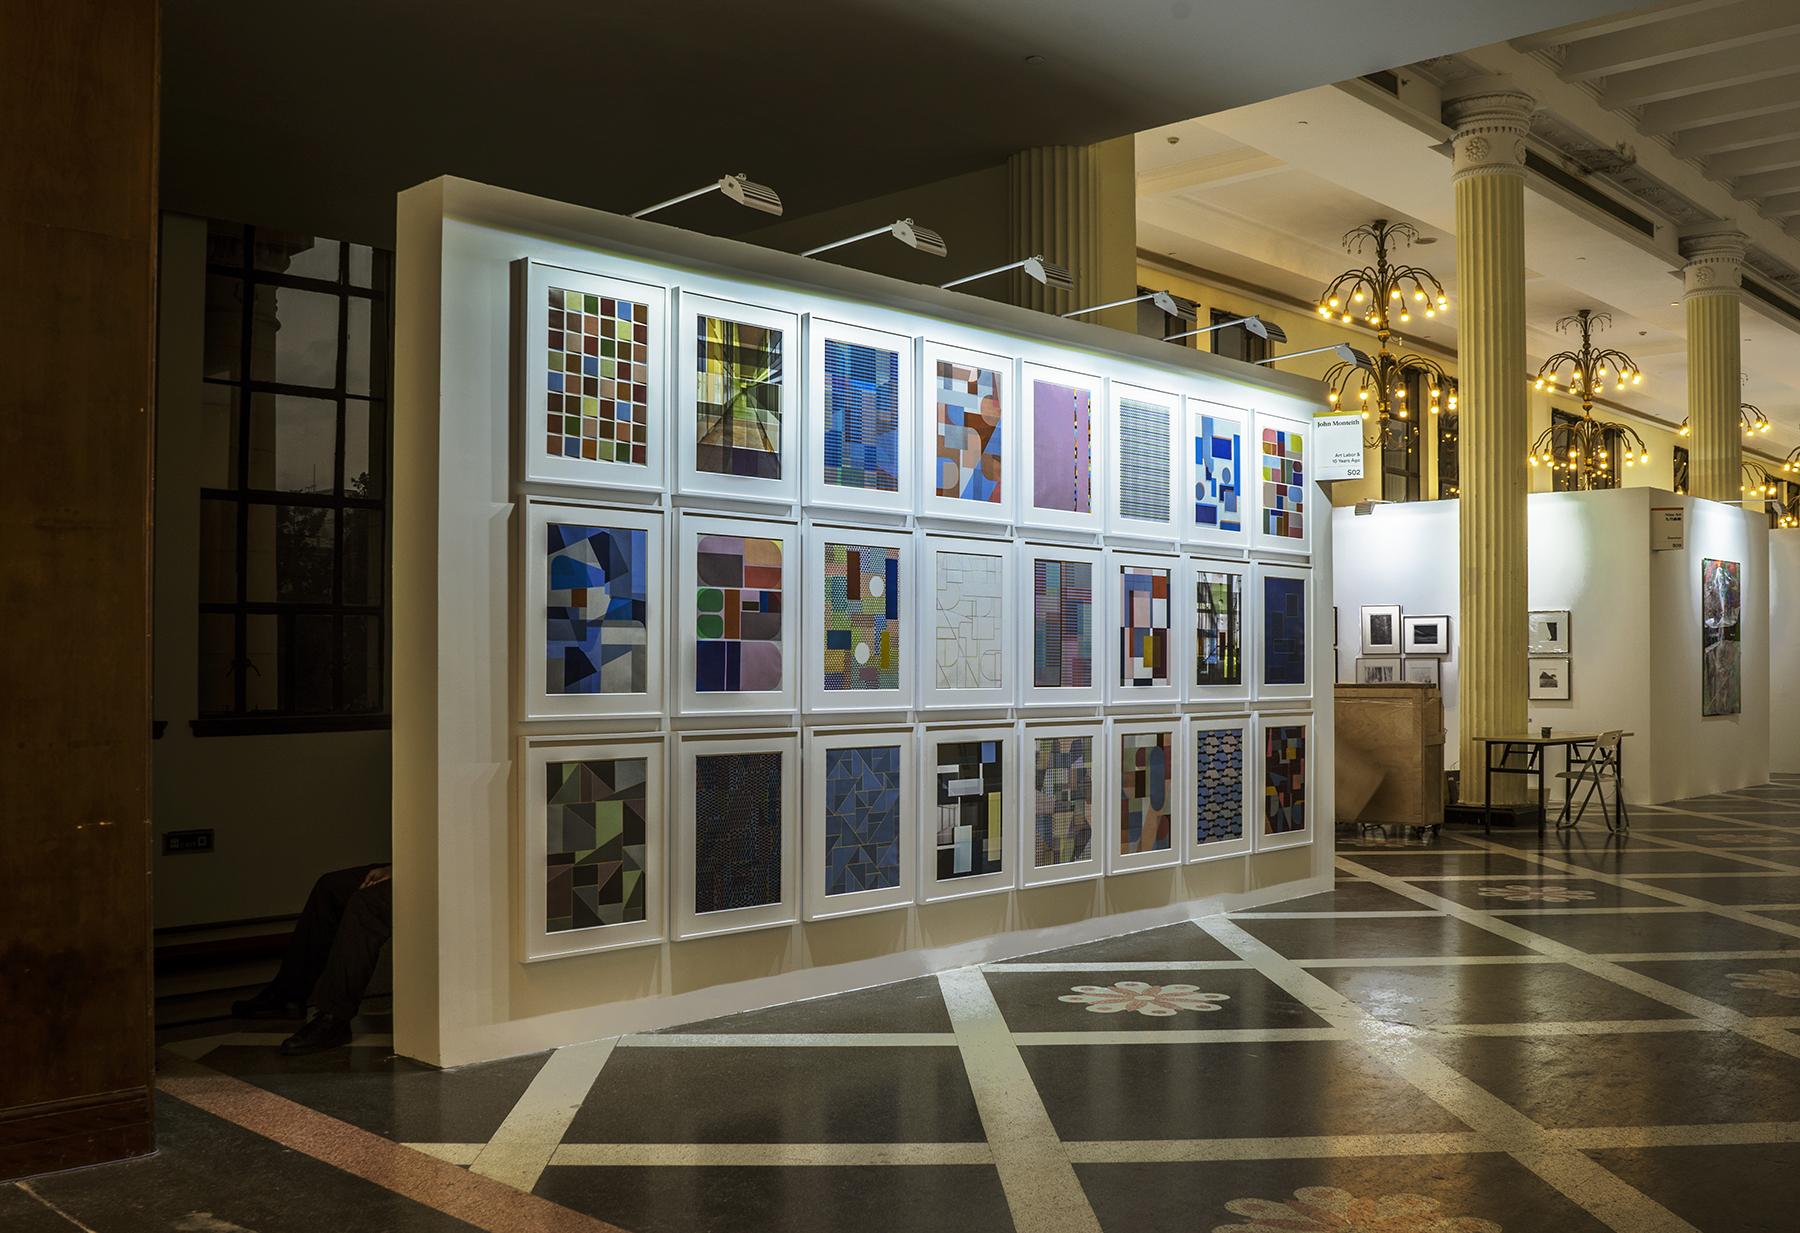 Resonances Installation, Photofairs Shanghai